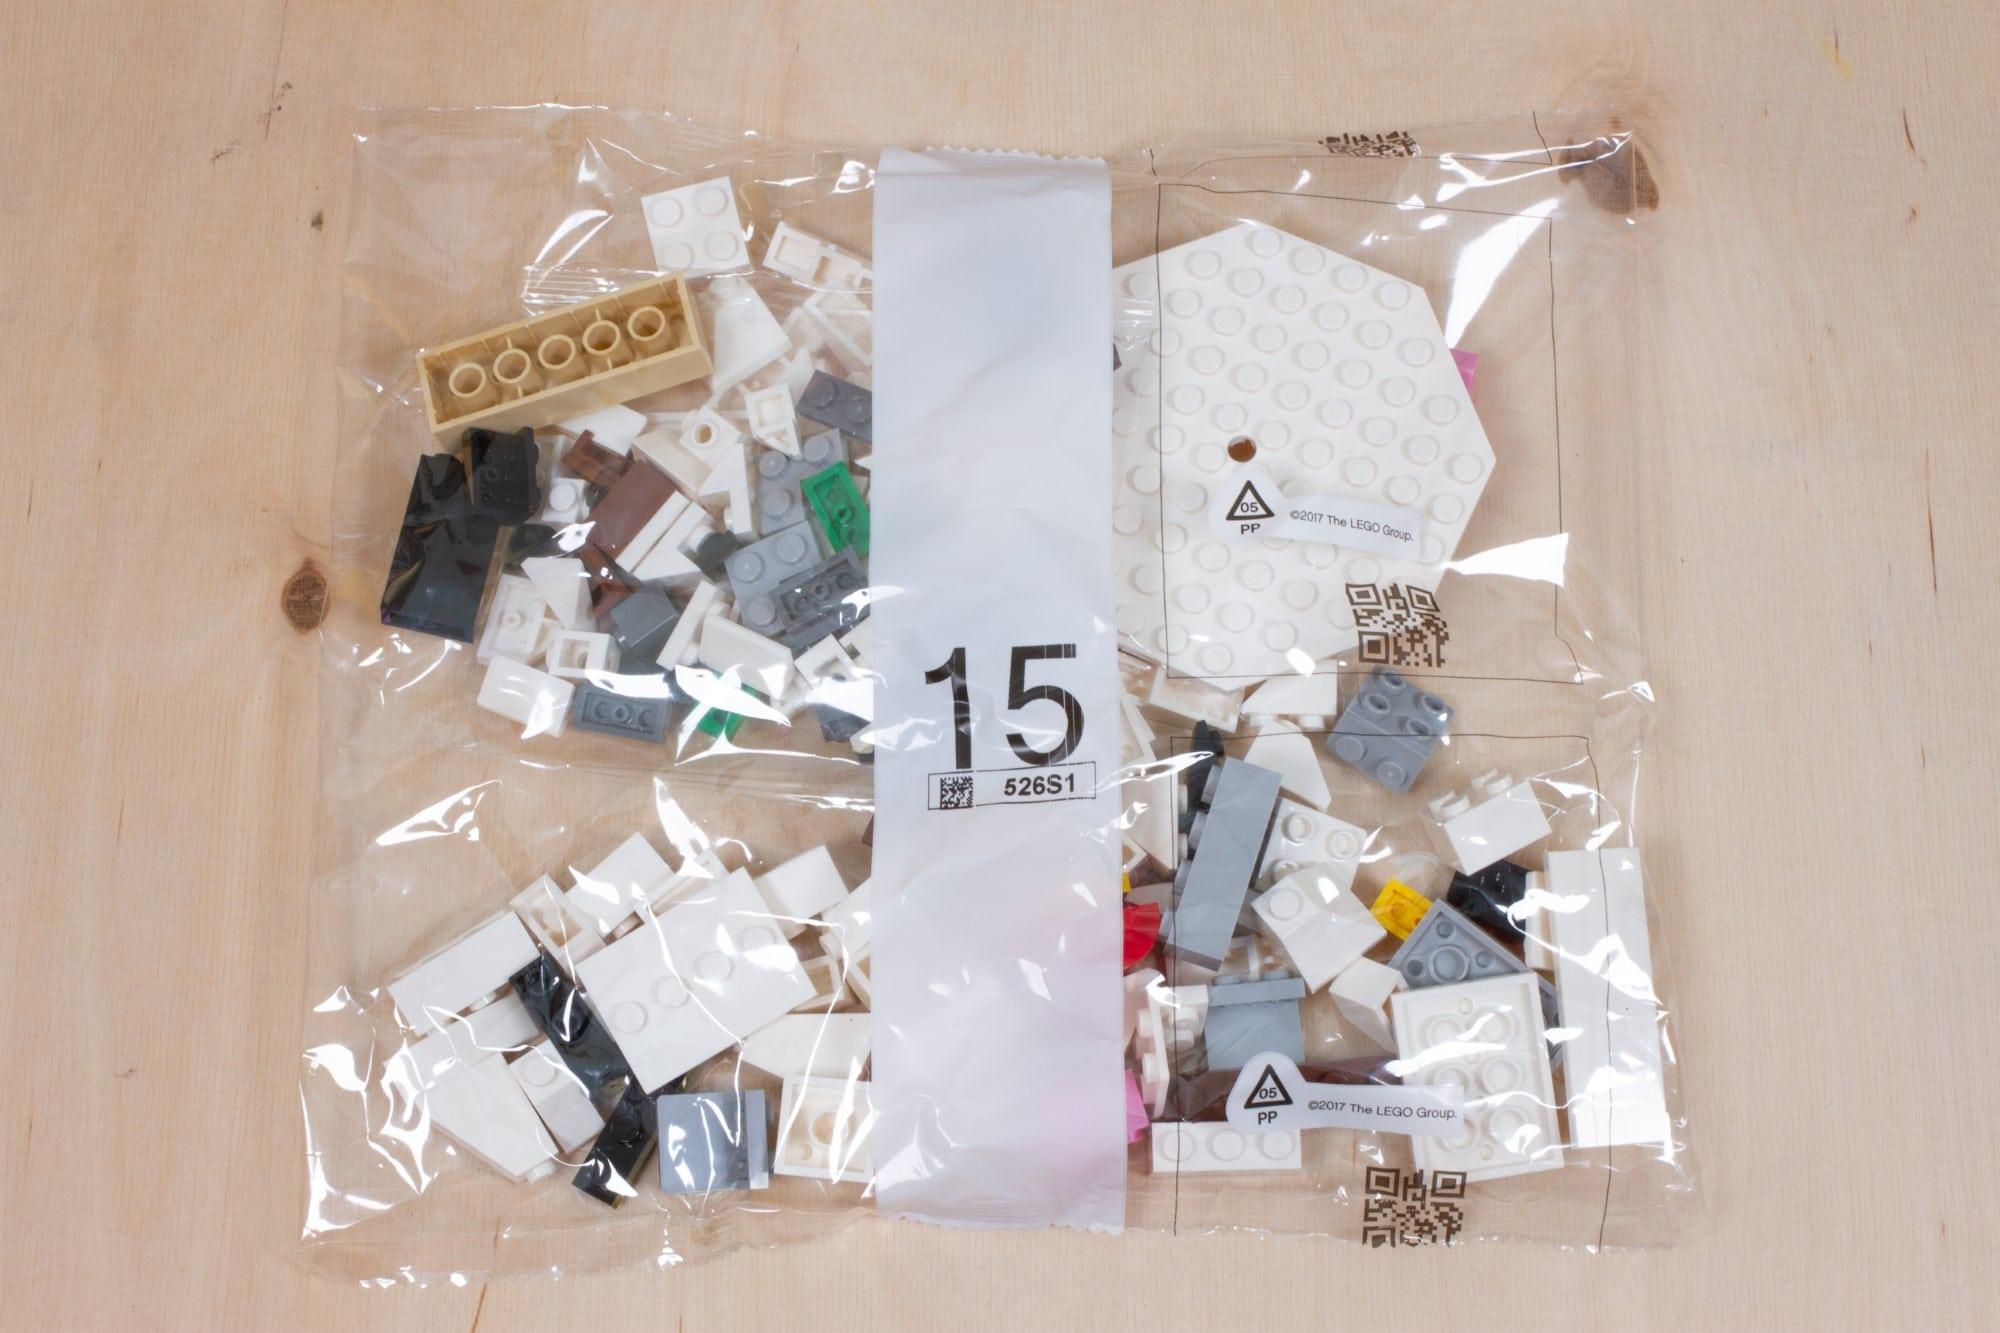 LEGO 76391 Hogwarts Icons Review Unboxing 2 Schritt 15